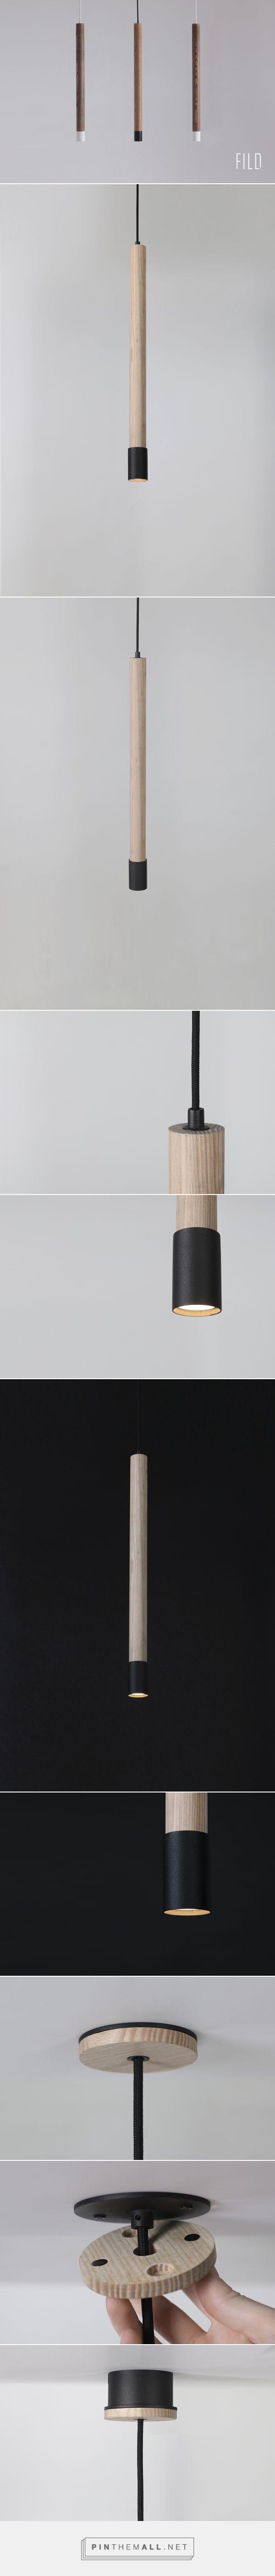 SO6 Pendant Lamp on Behance - created via https://pinthemall.net